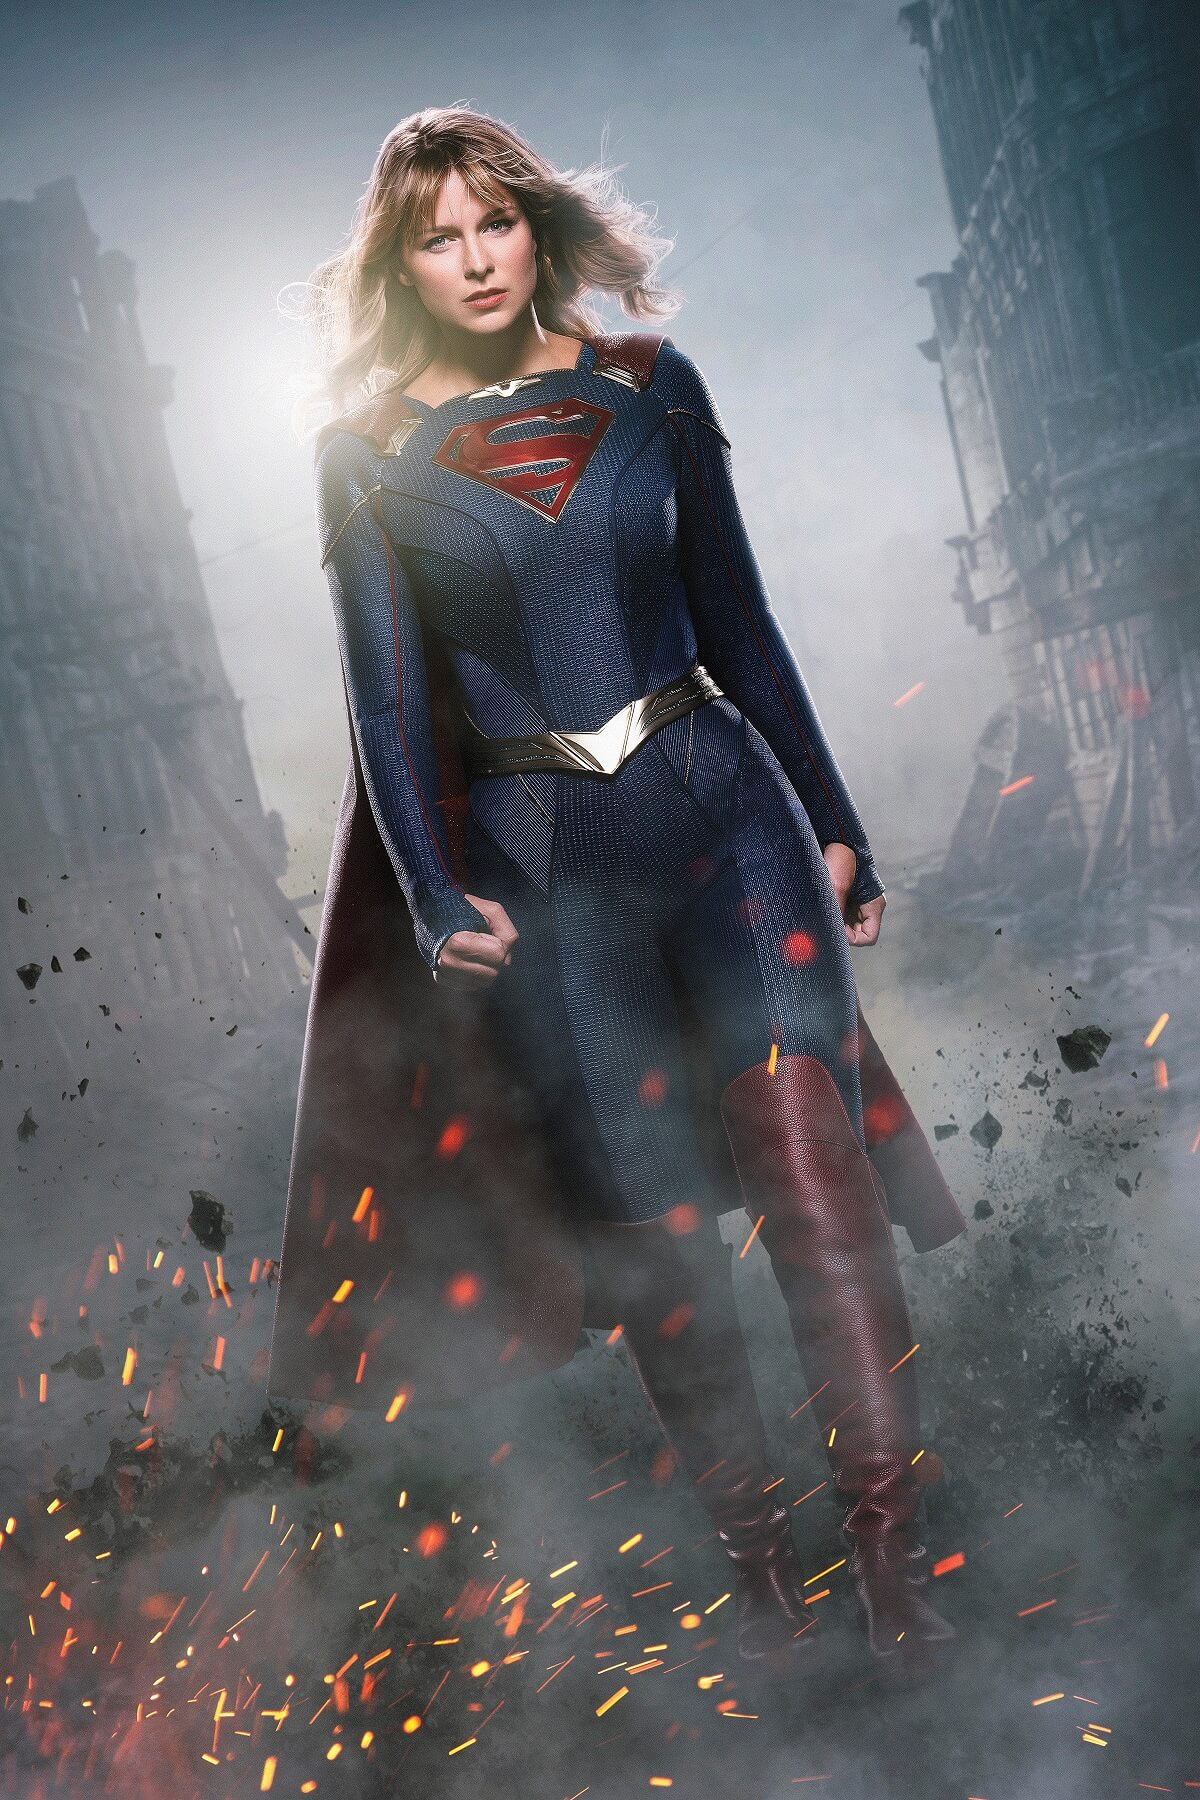 The Flash, Supergirl Cast News: Sendhil Ramamurthy, Julie